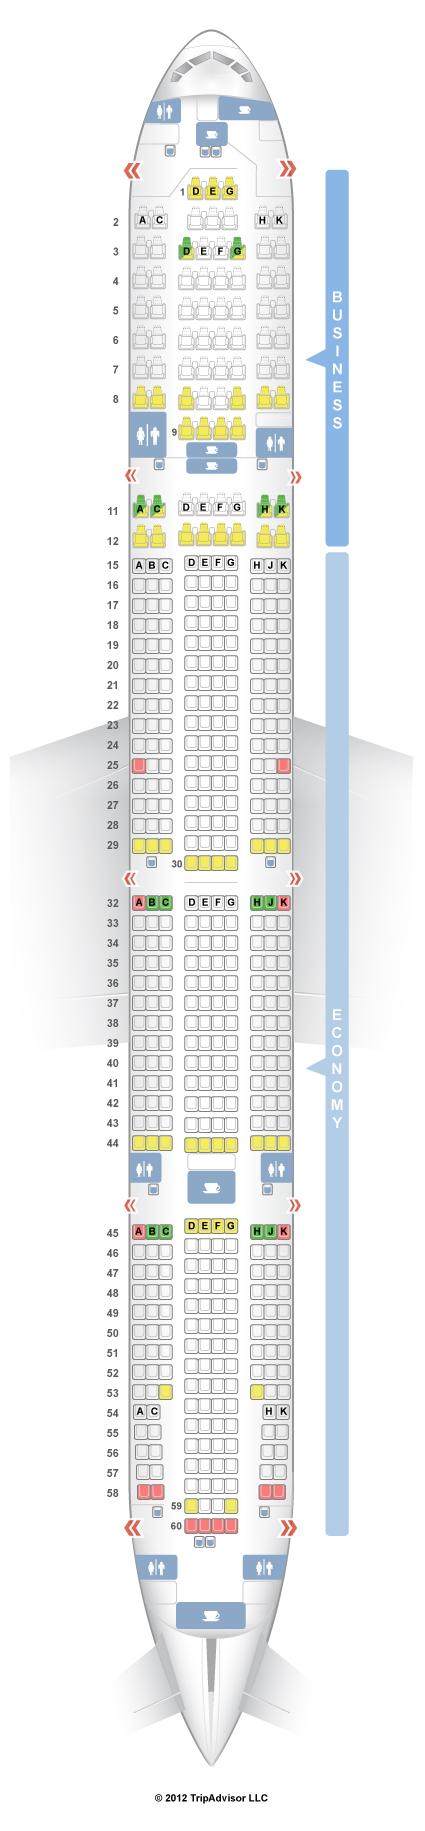 Seatguru seat map japan airlines boeing 777 300 773 for Plan cabine 777 300er